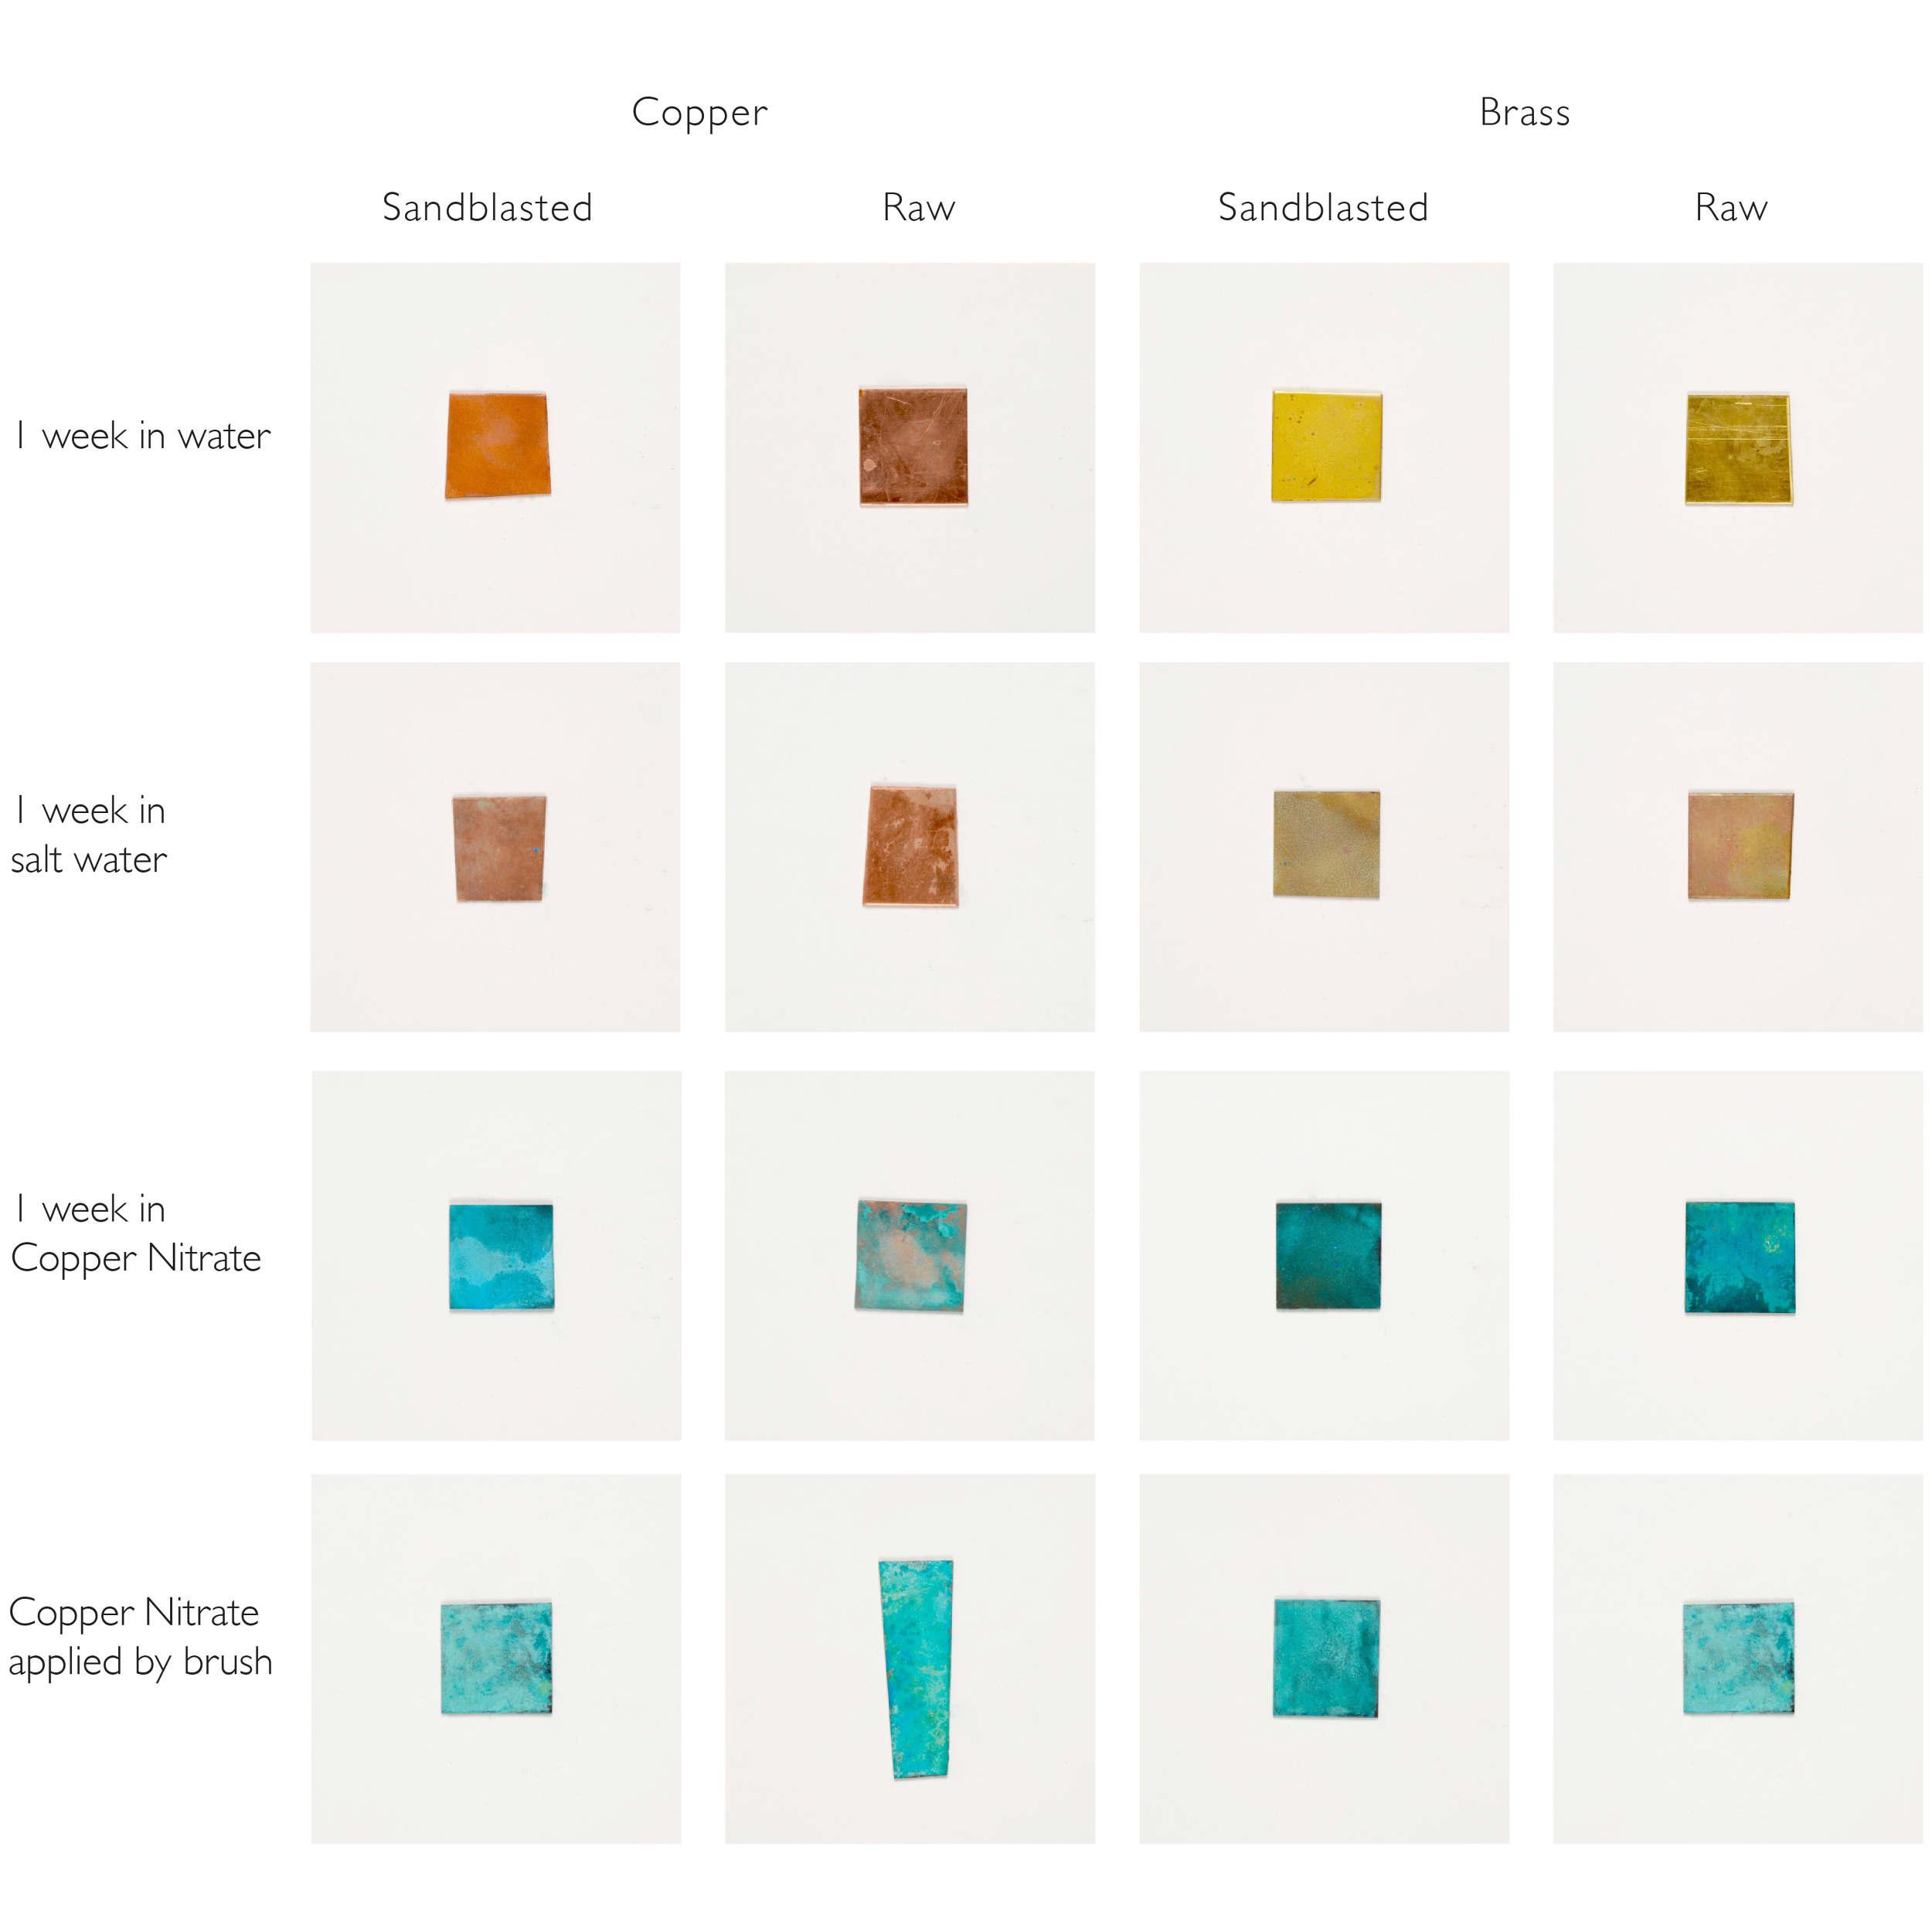 copper-brass-graph_2500_c.jpg